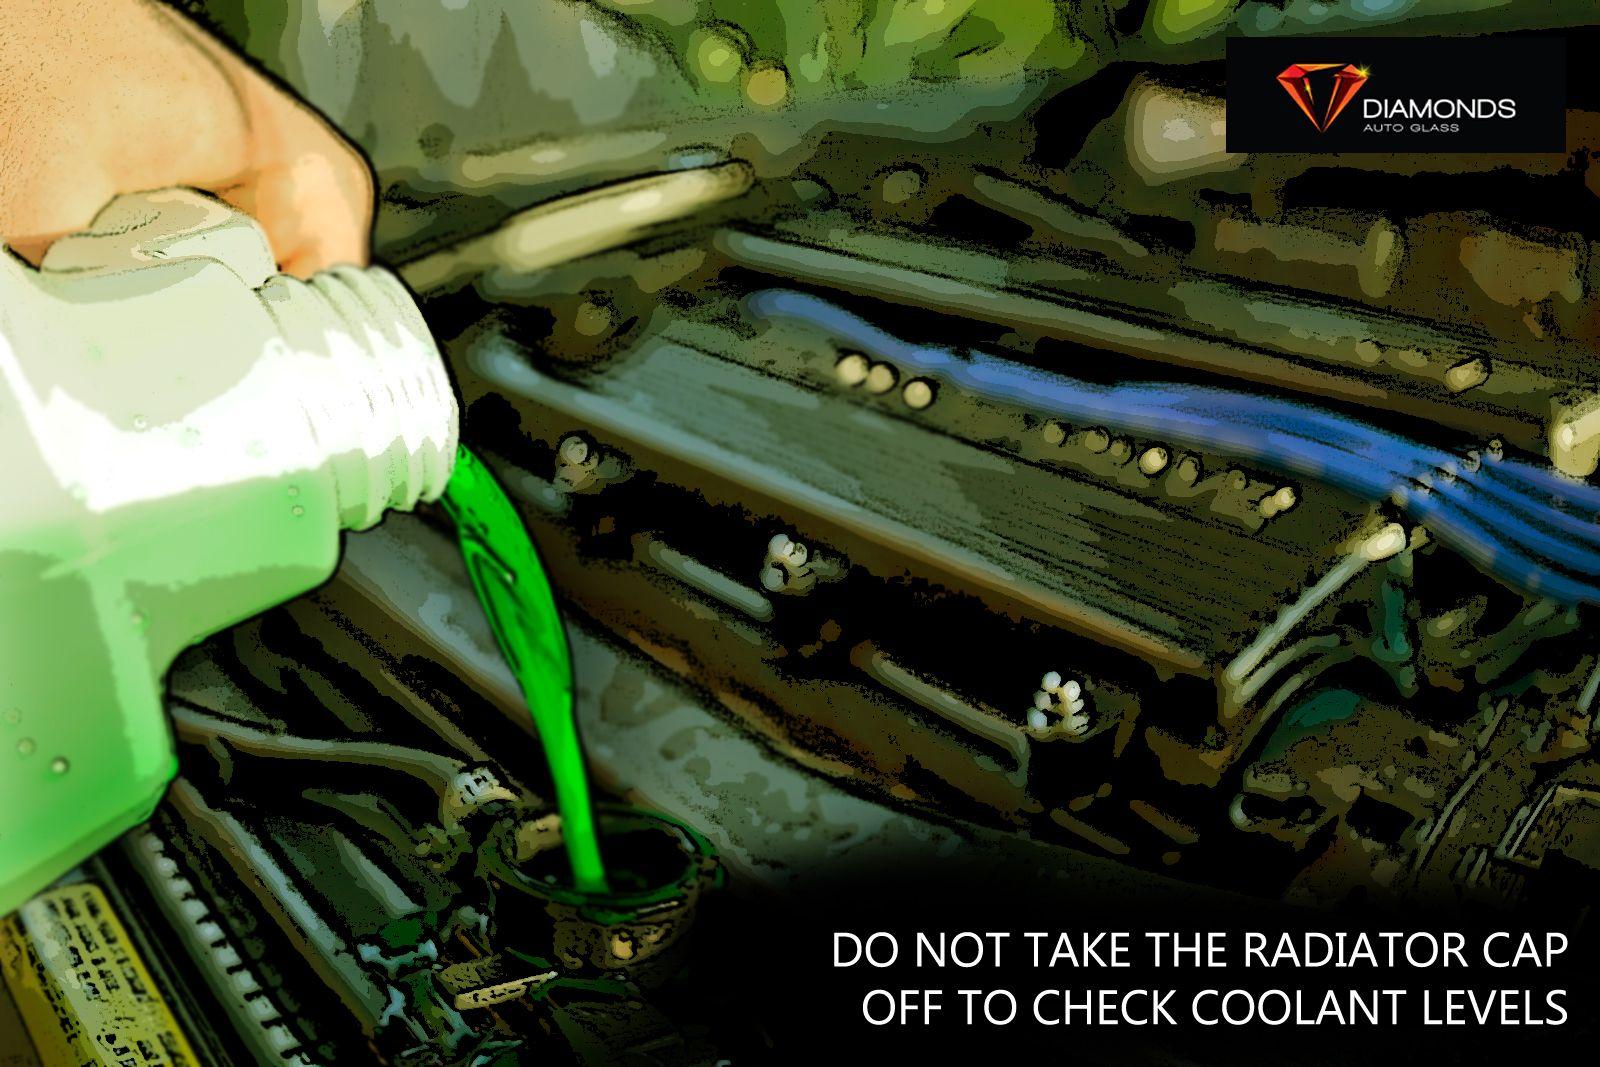 Car maintenance tip do not take the radiator cap off to